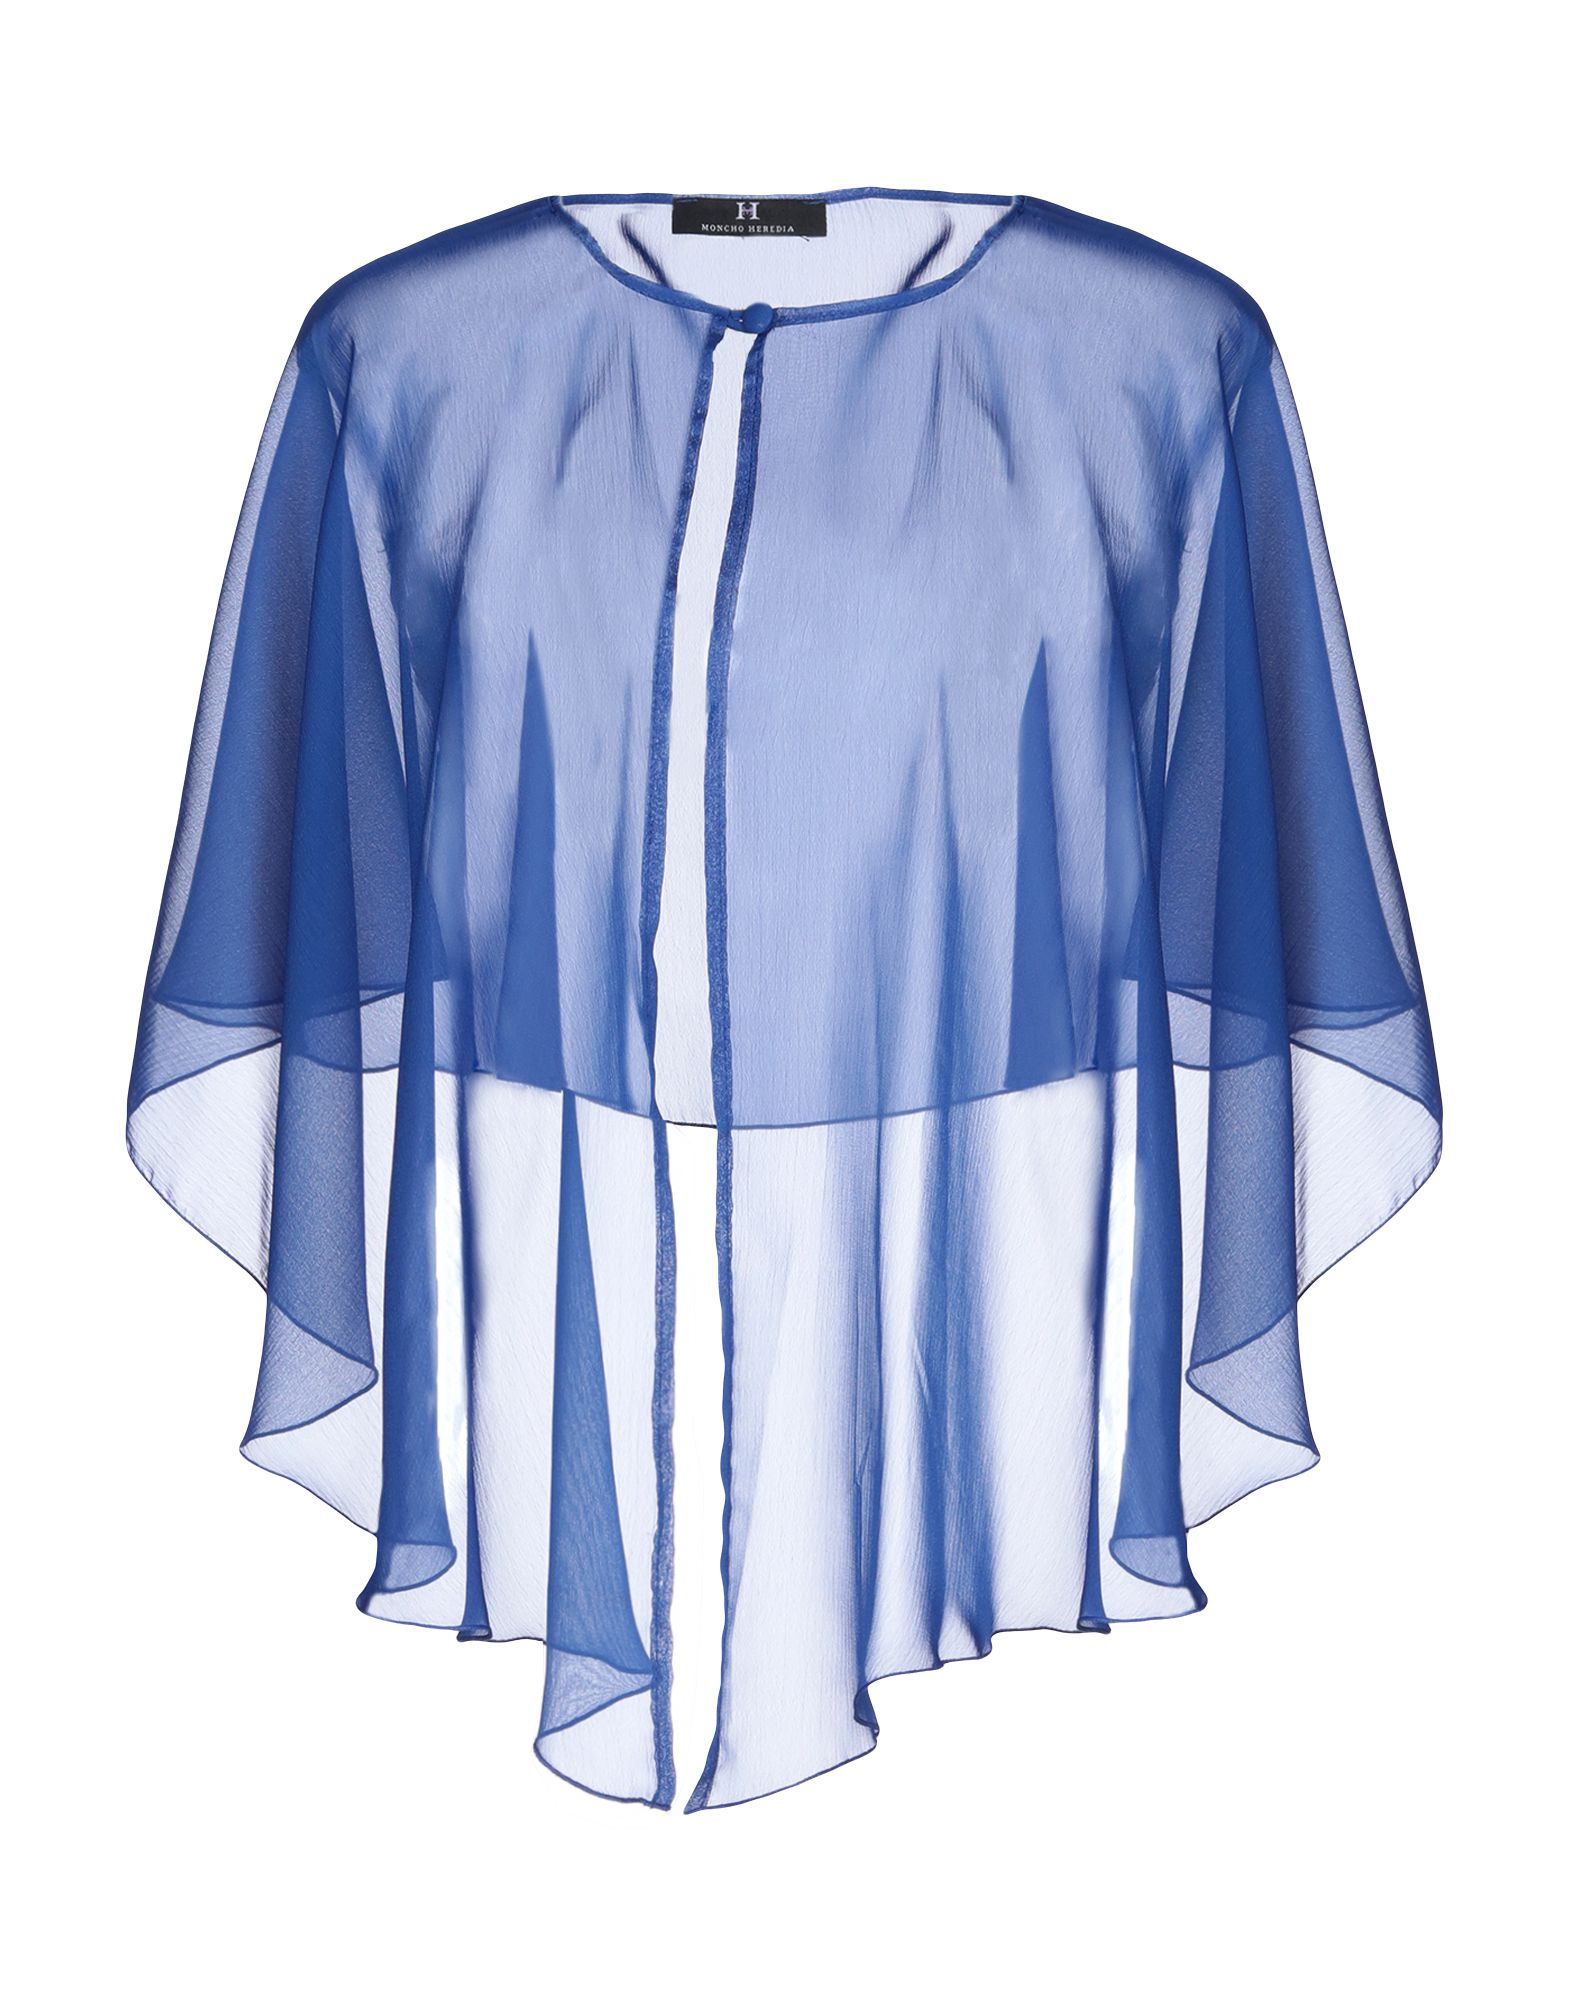 Cappa Moncho Herossoia Herossoia Herossoia donna - 41849854OC a73